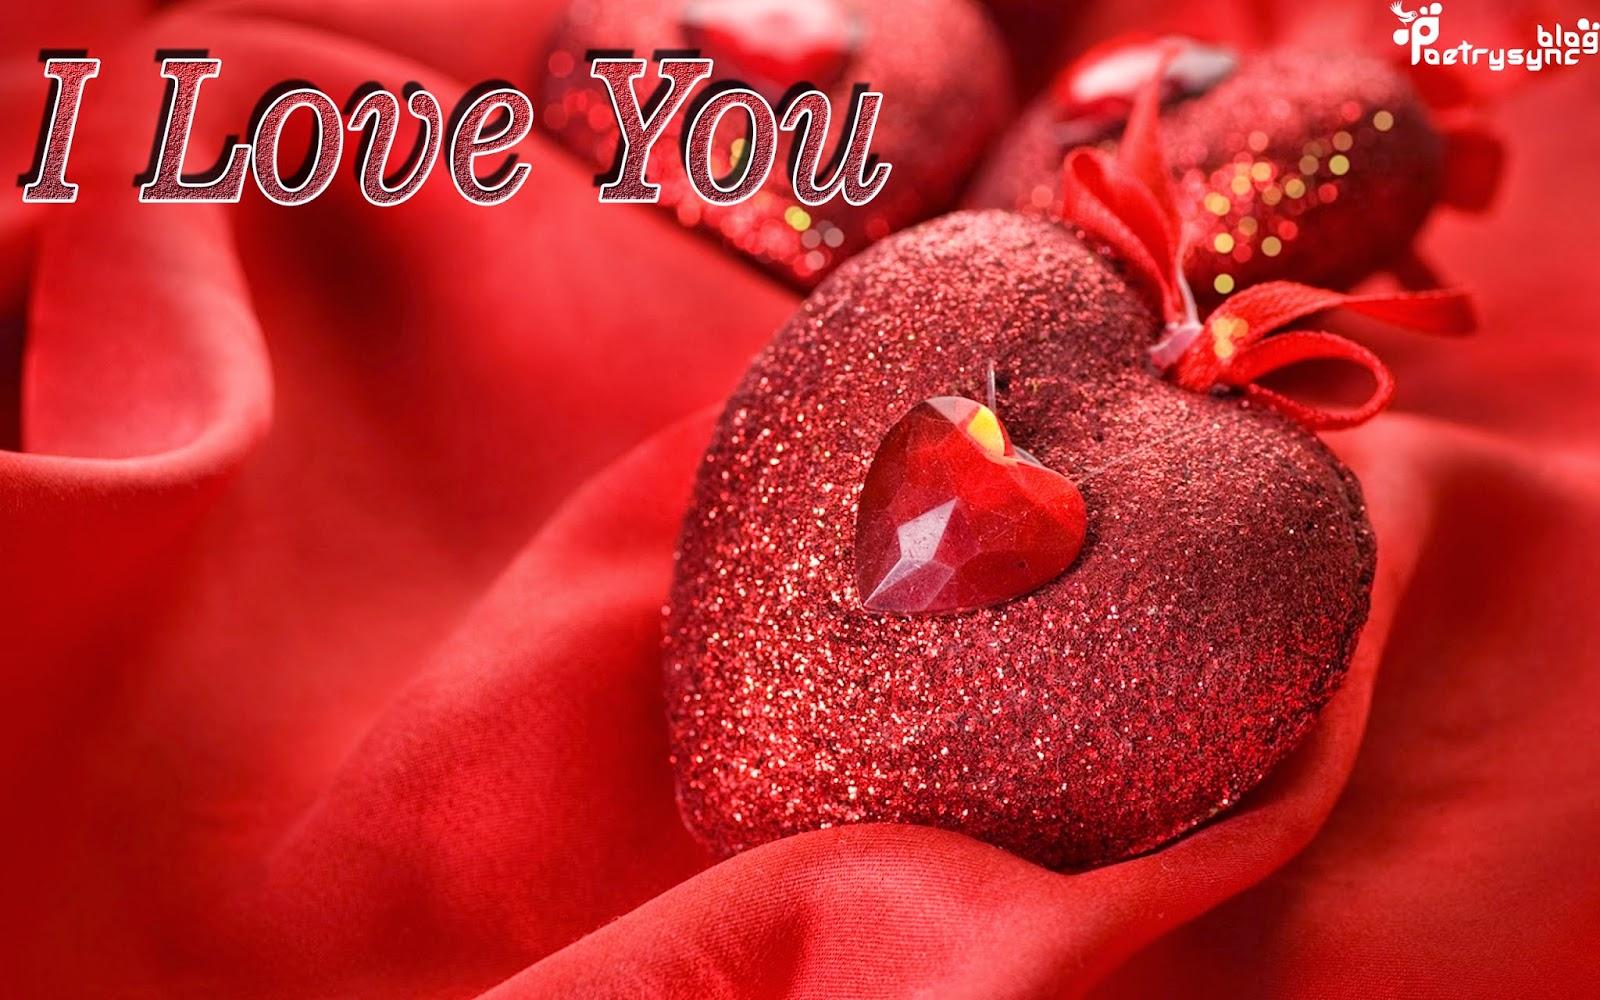 Love Red Heart Image Wallpaper HD